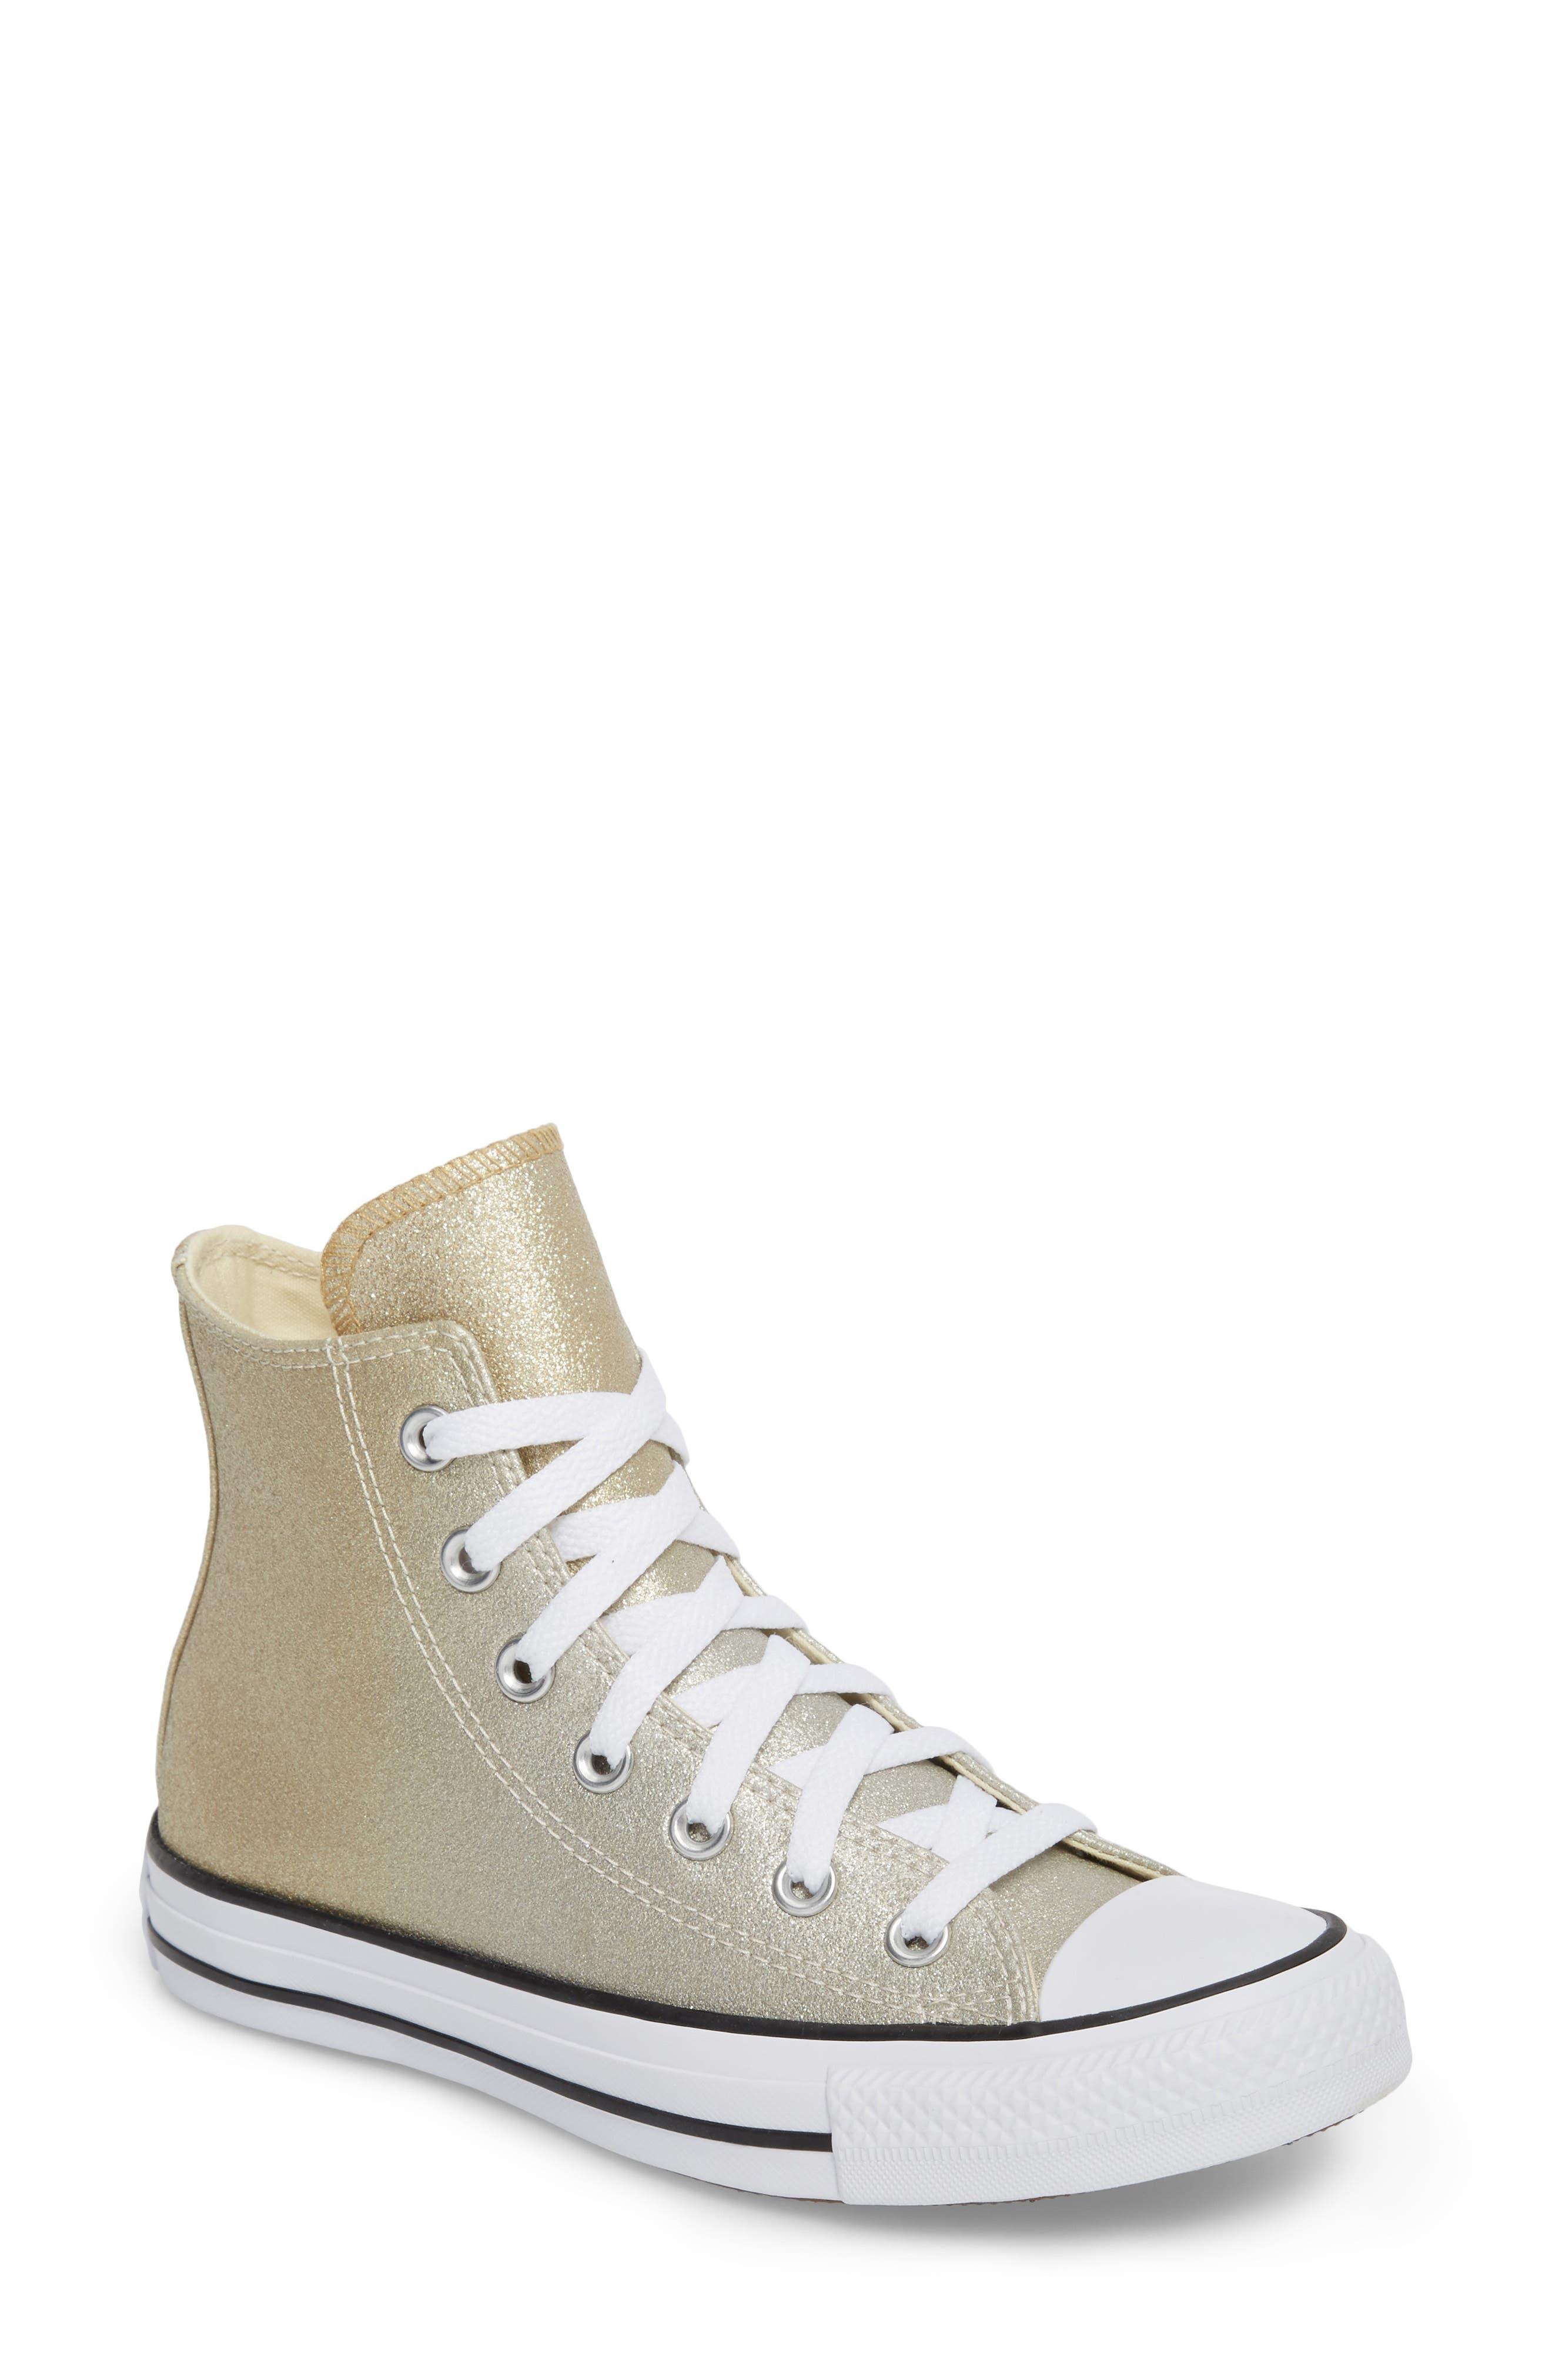 CONVERSE,                             Chuck Taylor<sup>®</sup> All Star<sup>®</sup> Ombré Metallic High Top Sneaker,                             Main thumbnail 1, color,                             710